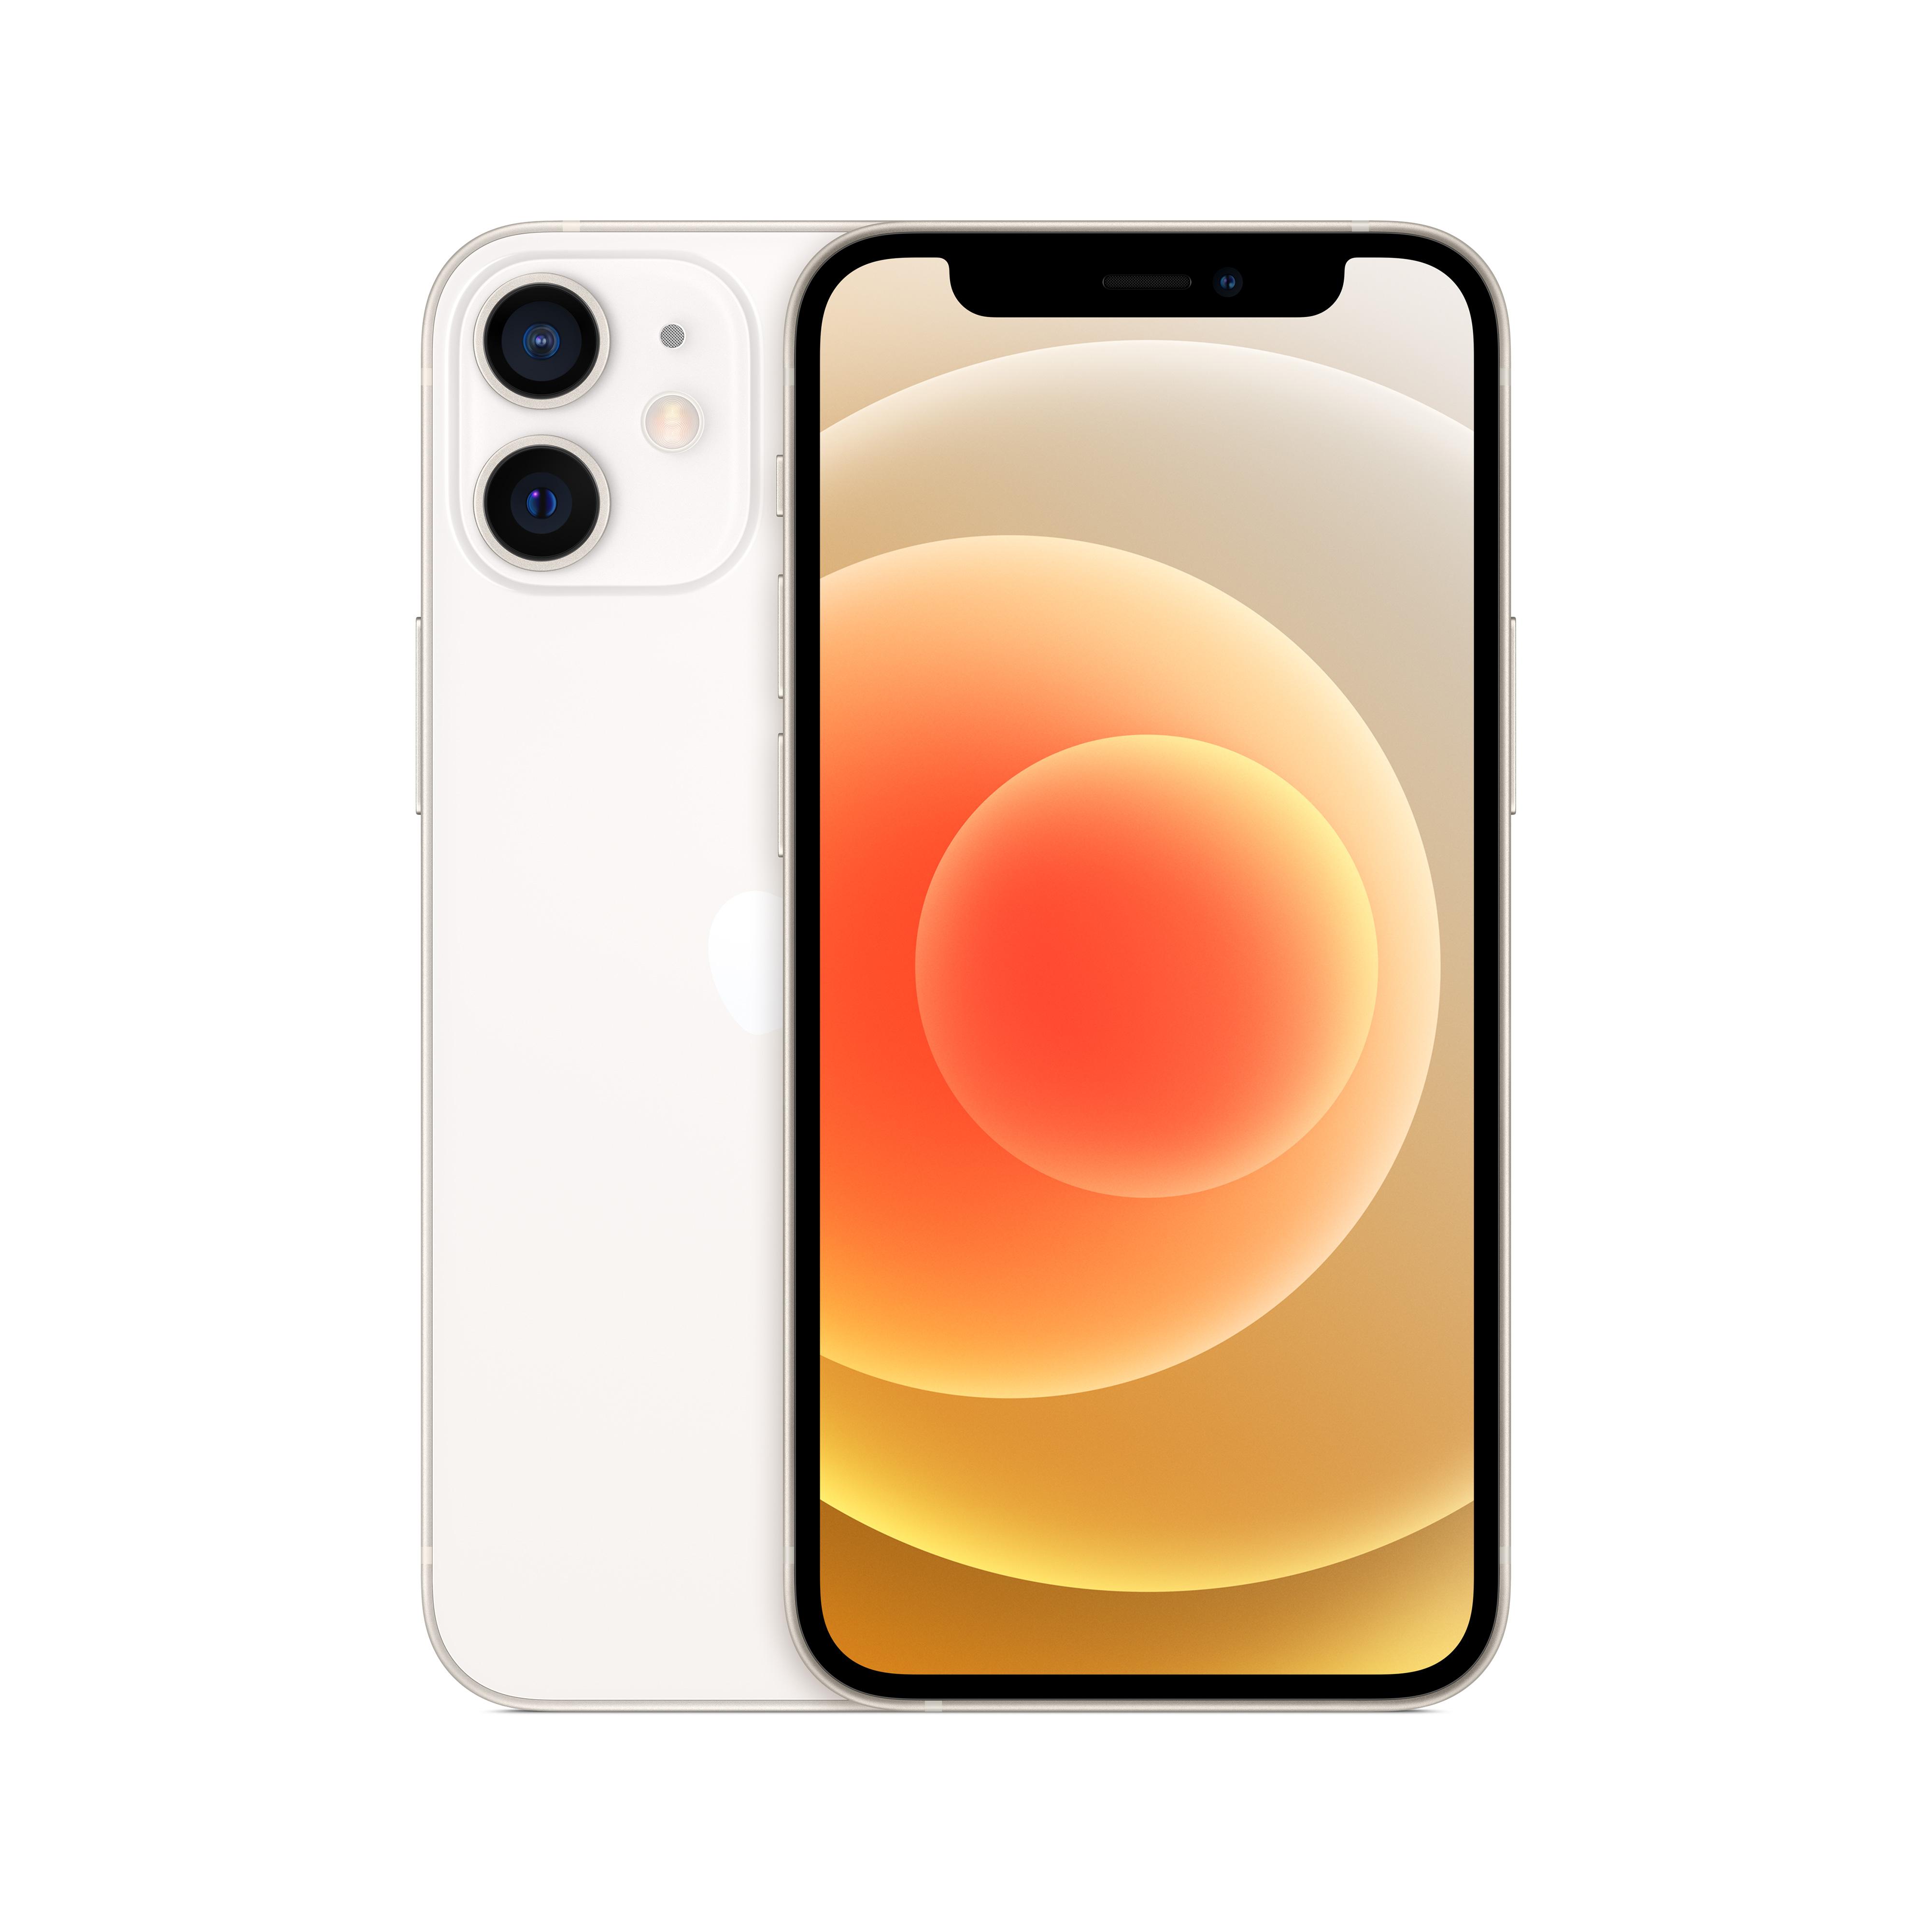 Ios Cartina Geografica.Tim Apple Iphone 12 Mini 13 7 Cm 5 4 Doppia Sim Ios 14 5g 128 Gb Bianco Carrefour